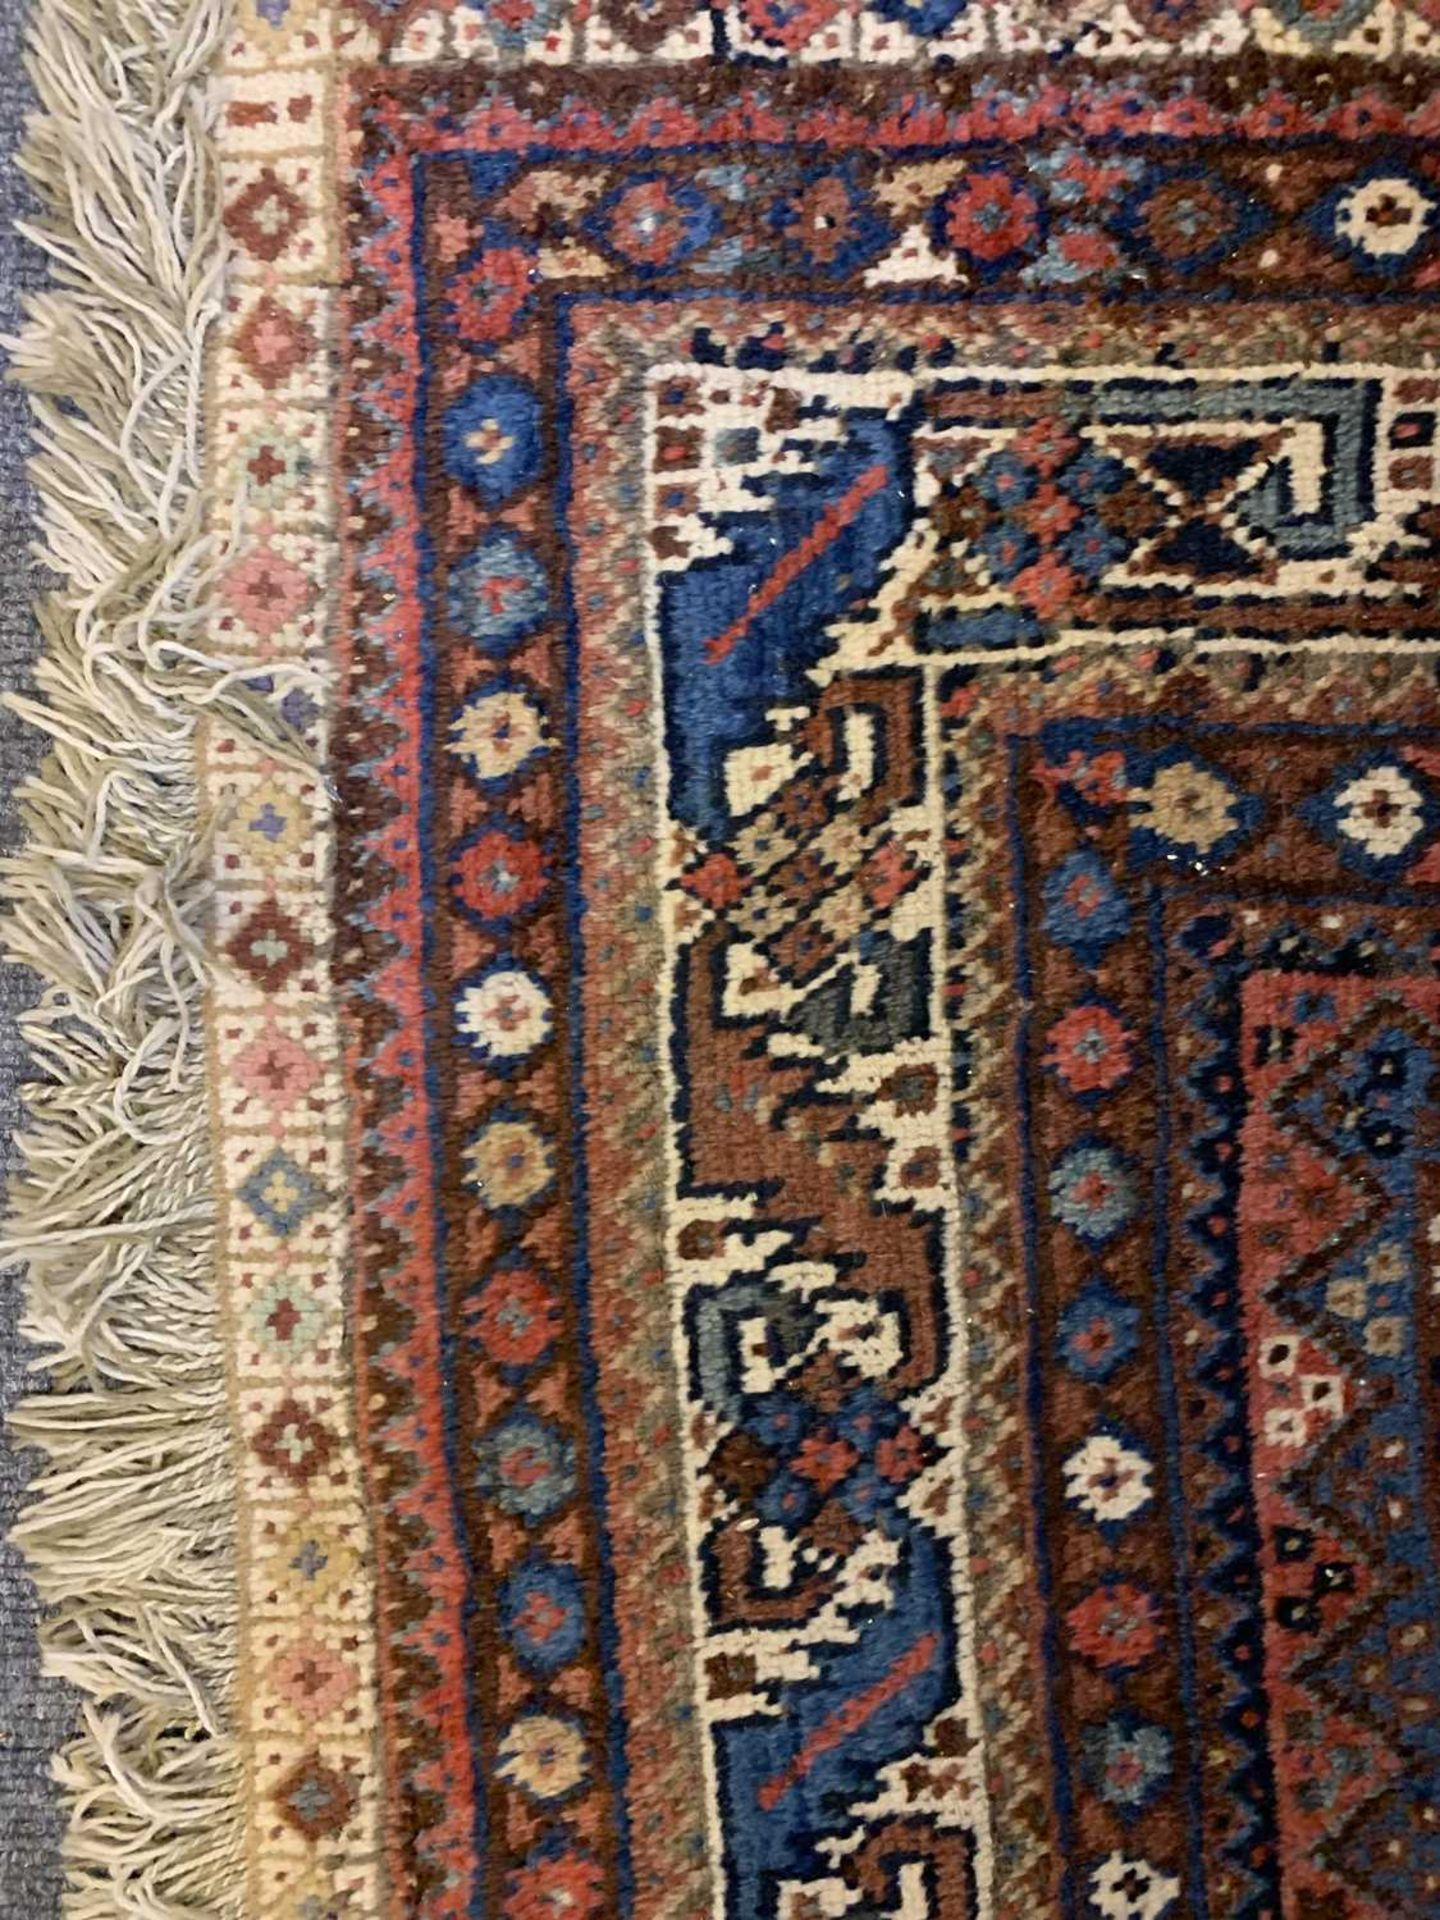 A South West Persian Khamseh carpet, - Image 9 of 17